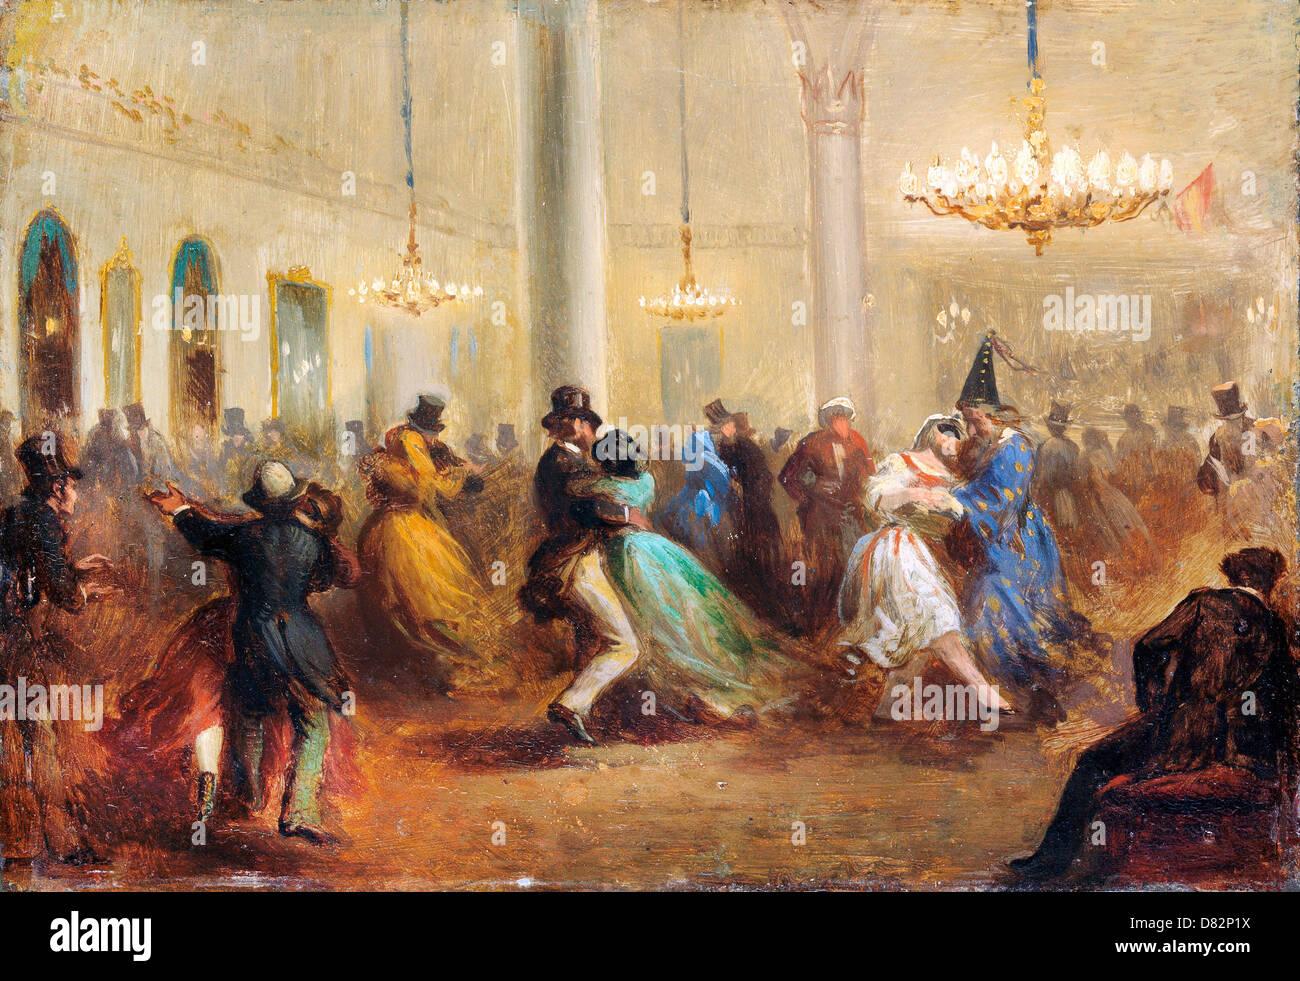 Ricardo Balaca, The Baile de Capellanes 1860-1865 Oil on tinplate. Bilbao Fine Arts Museum, Bilbao, Spain. - Stock Image